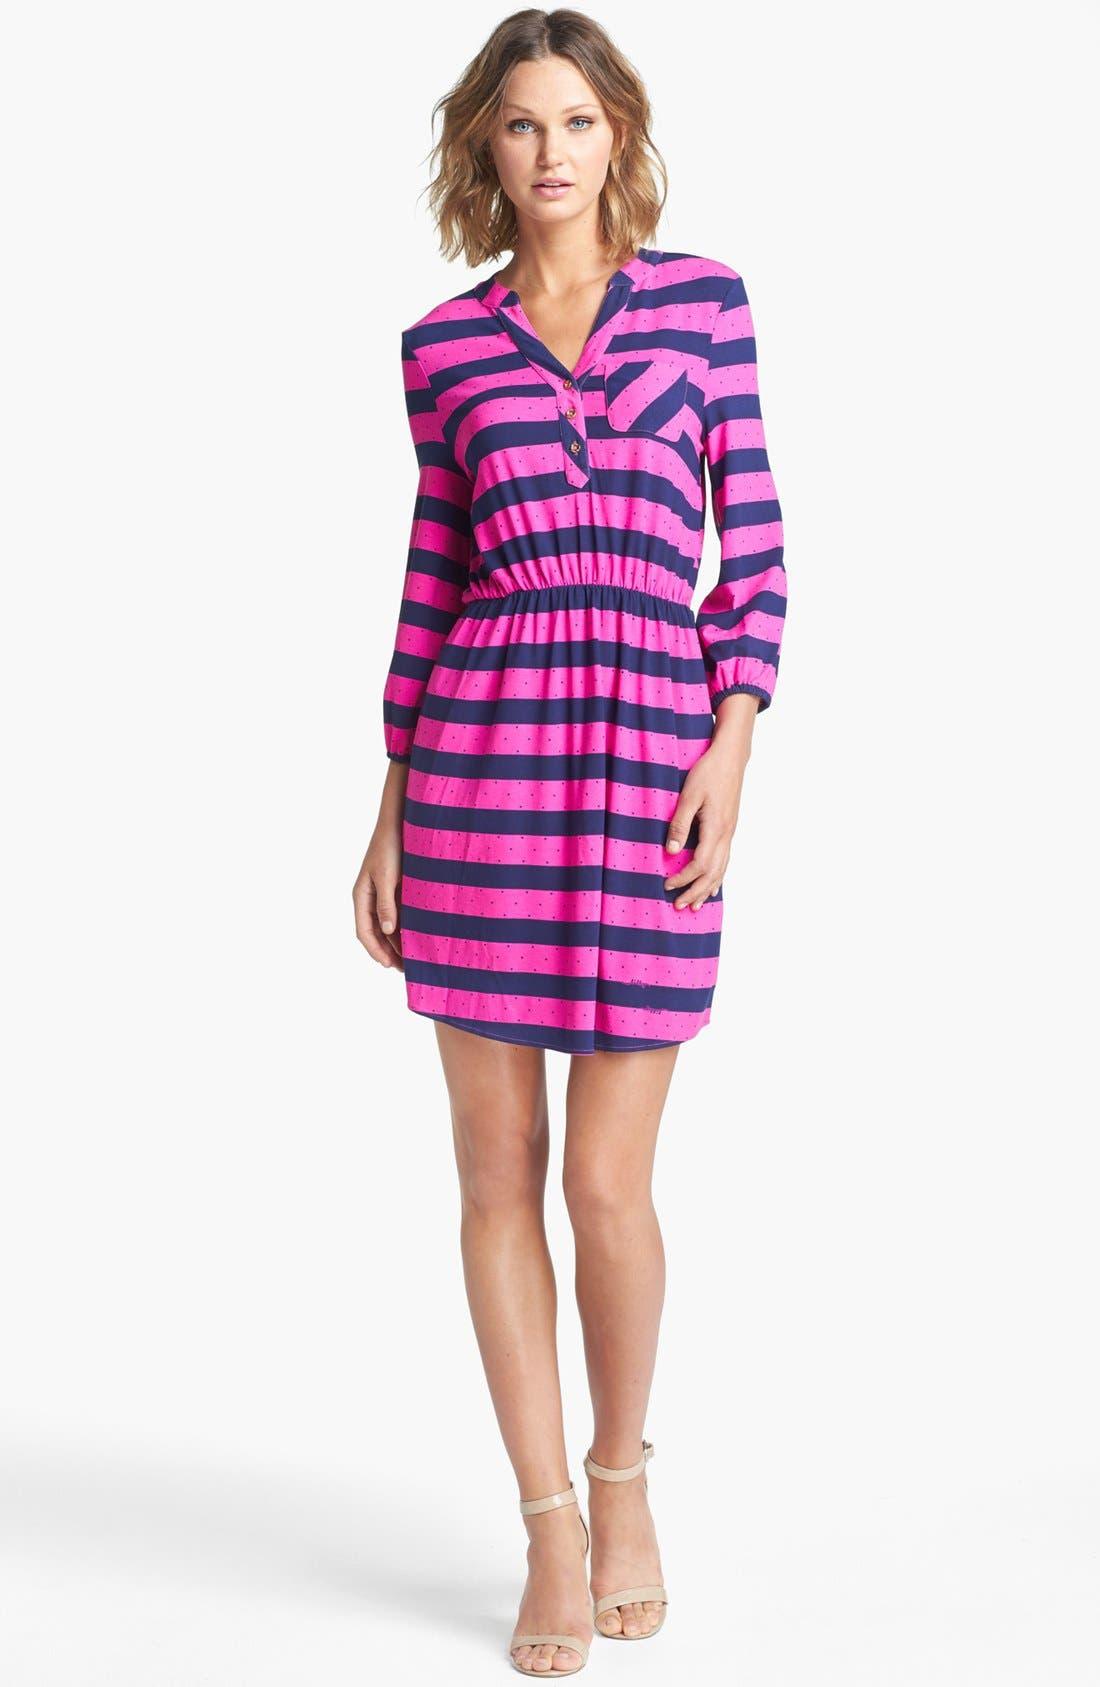 Alternate Image 1 Selected - Lilly Pulitzer® 'Beckett' Stripe Shirtdress